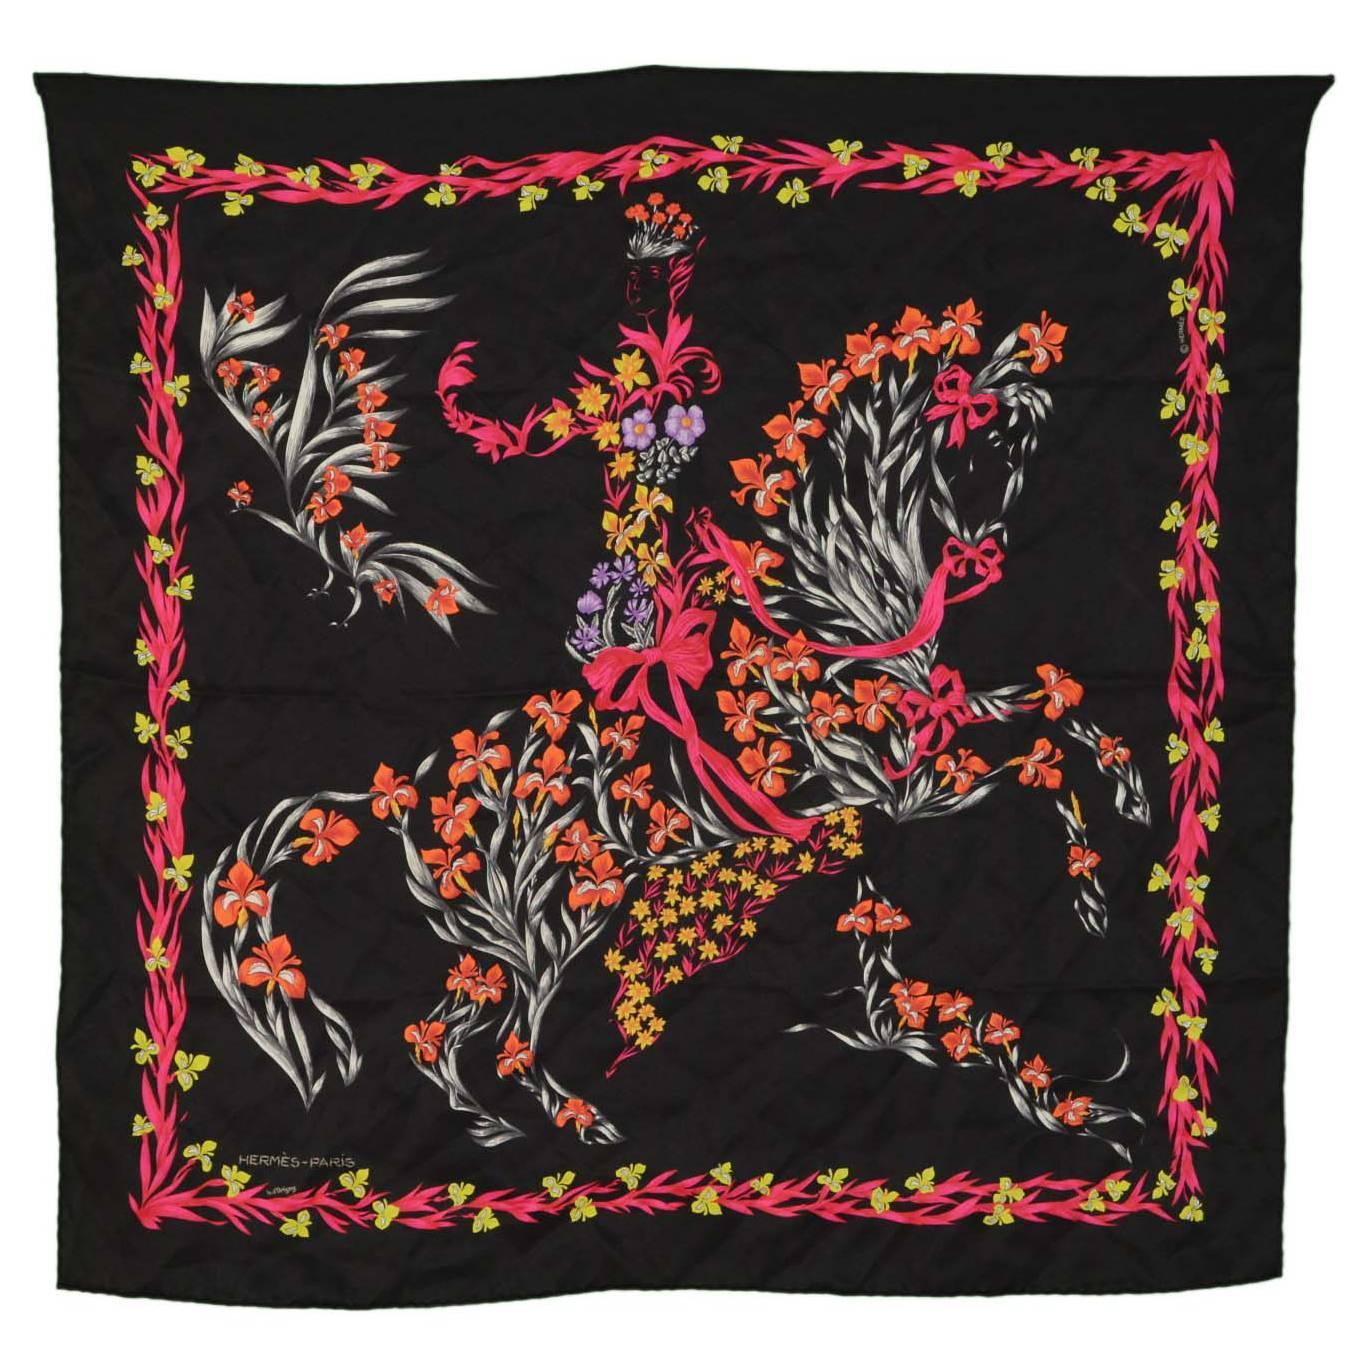 Hermes Black Floral Horse Print 70cm Silk Scarf at 1stdibs